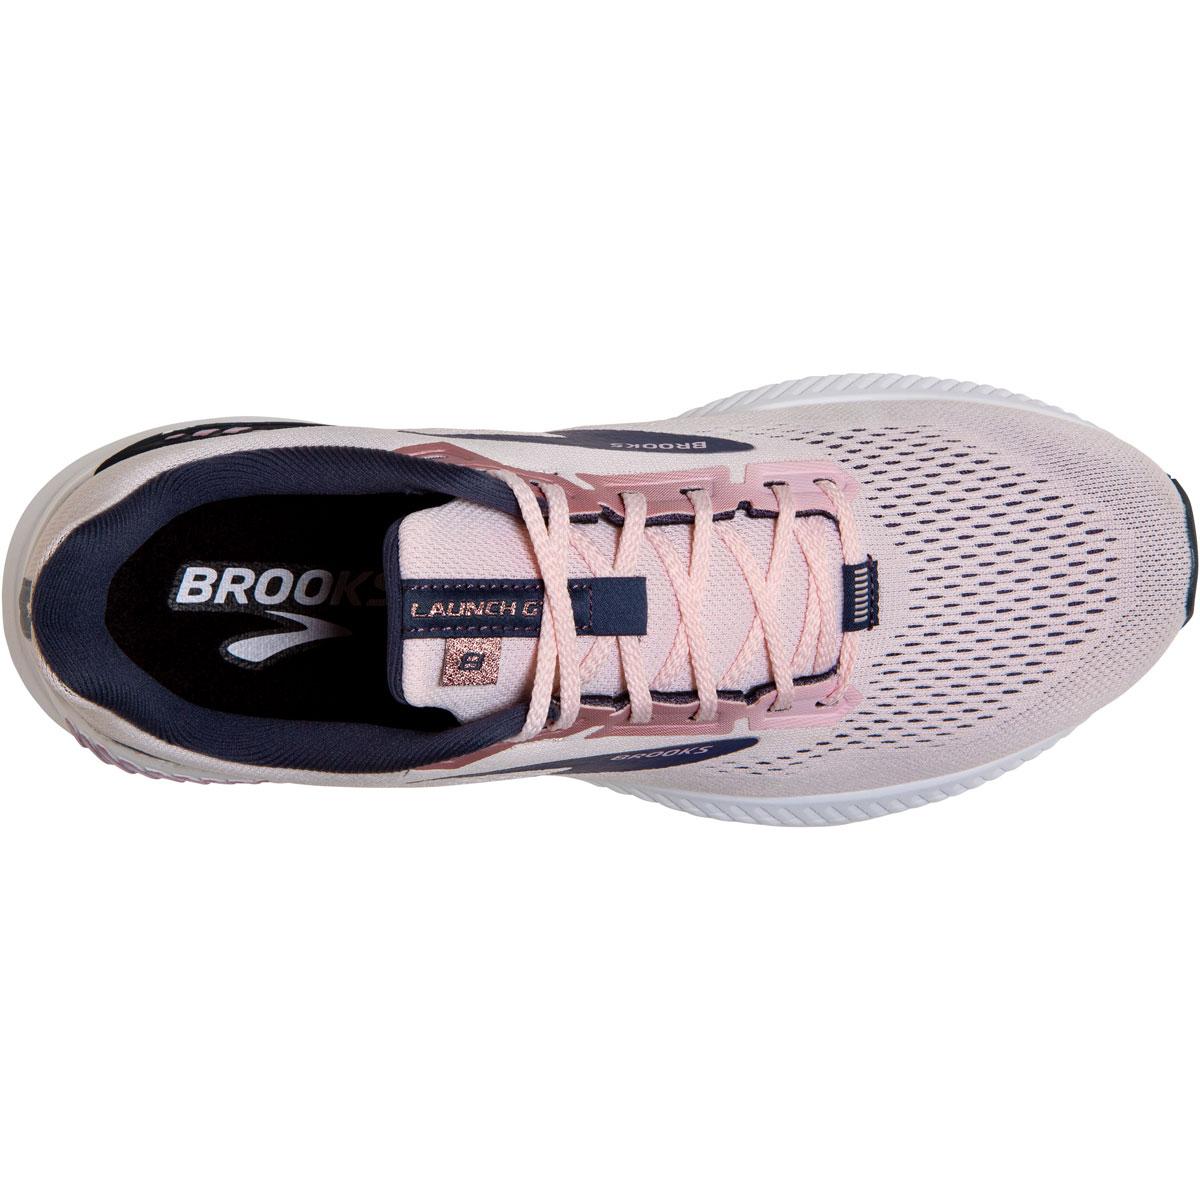 Women's Brooks Launch GTS 8 Running Shoe - Color: Primrose/Ombre - Size: 5 - Width: Regular, Primrose/Ombre, large, image 4